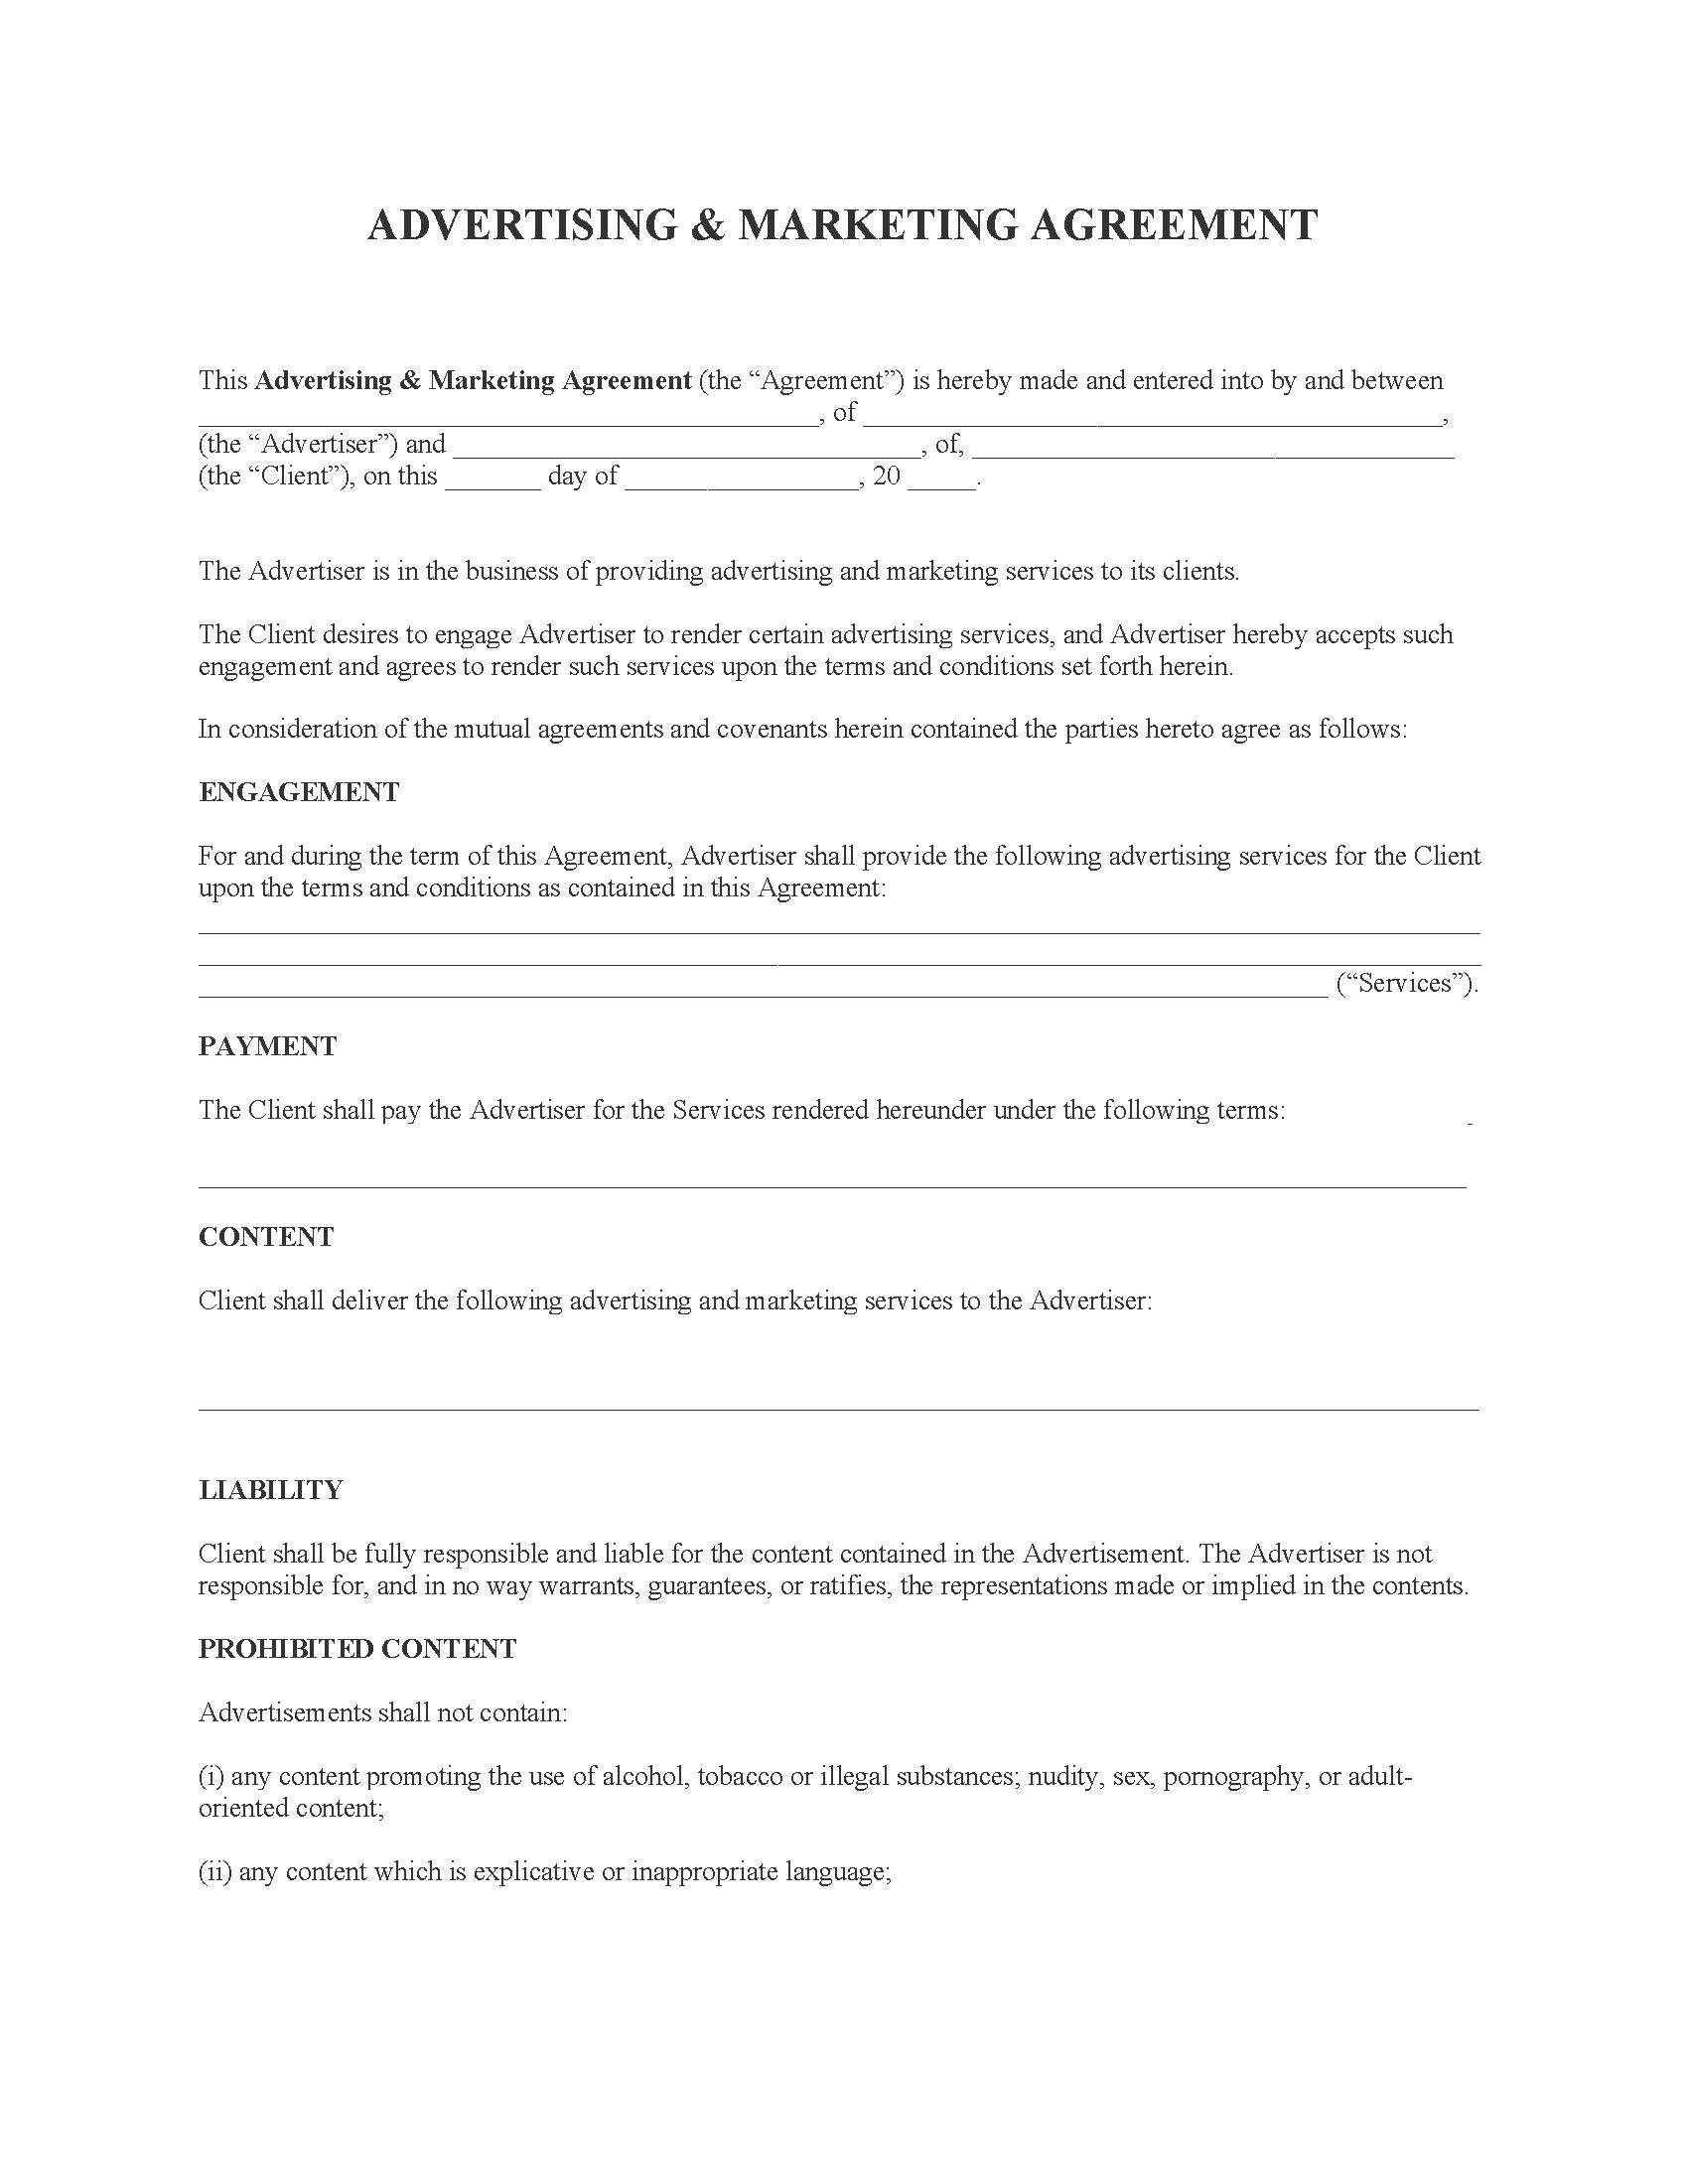 Advertising & Marketing Agreement